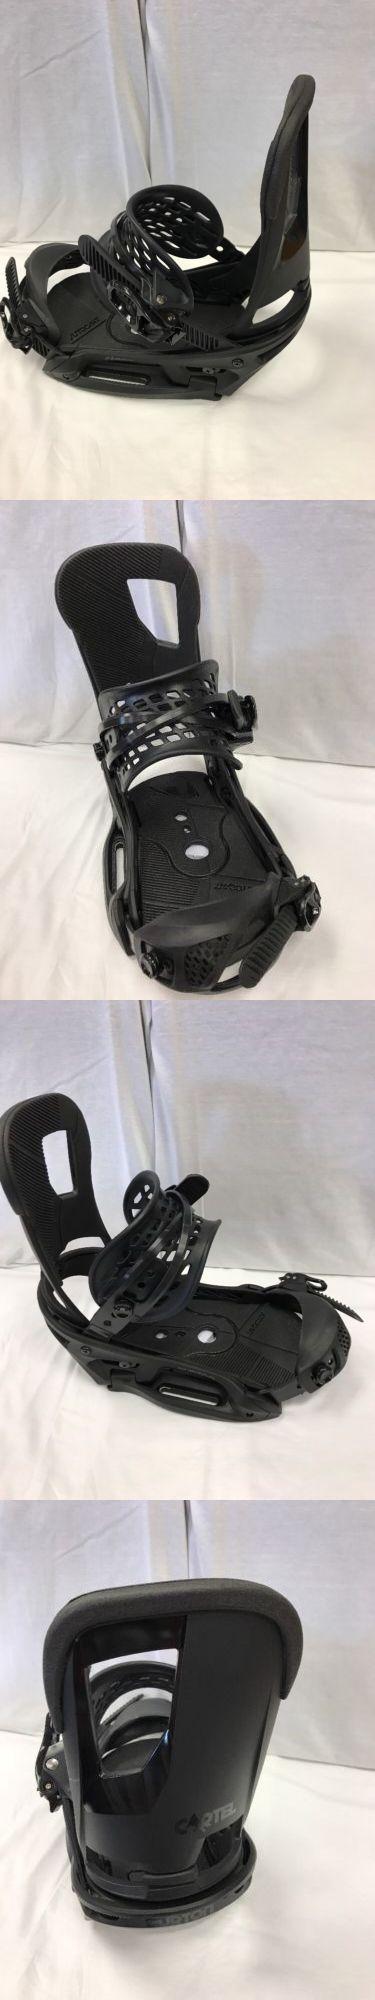 Bindings 21248: Brand New 2017 Burton Cartel Est Snowboard Bindings Size Medium -> BUY IT NOW ONLY: $229 on eBay!